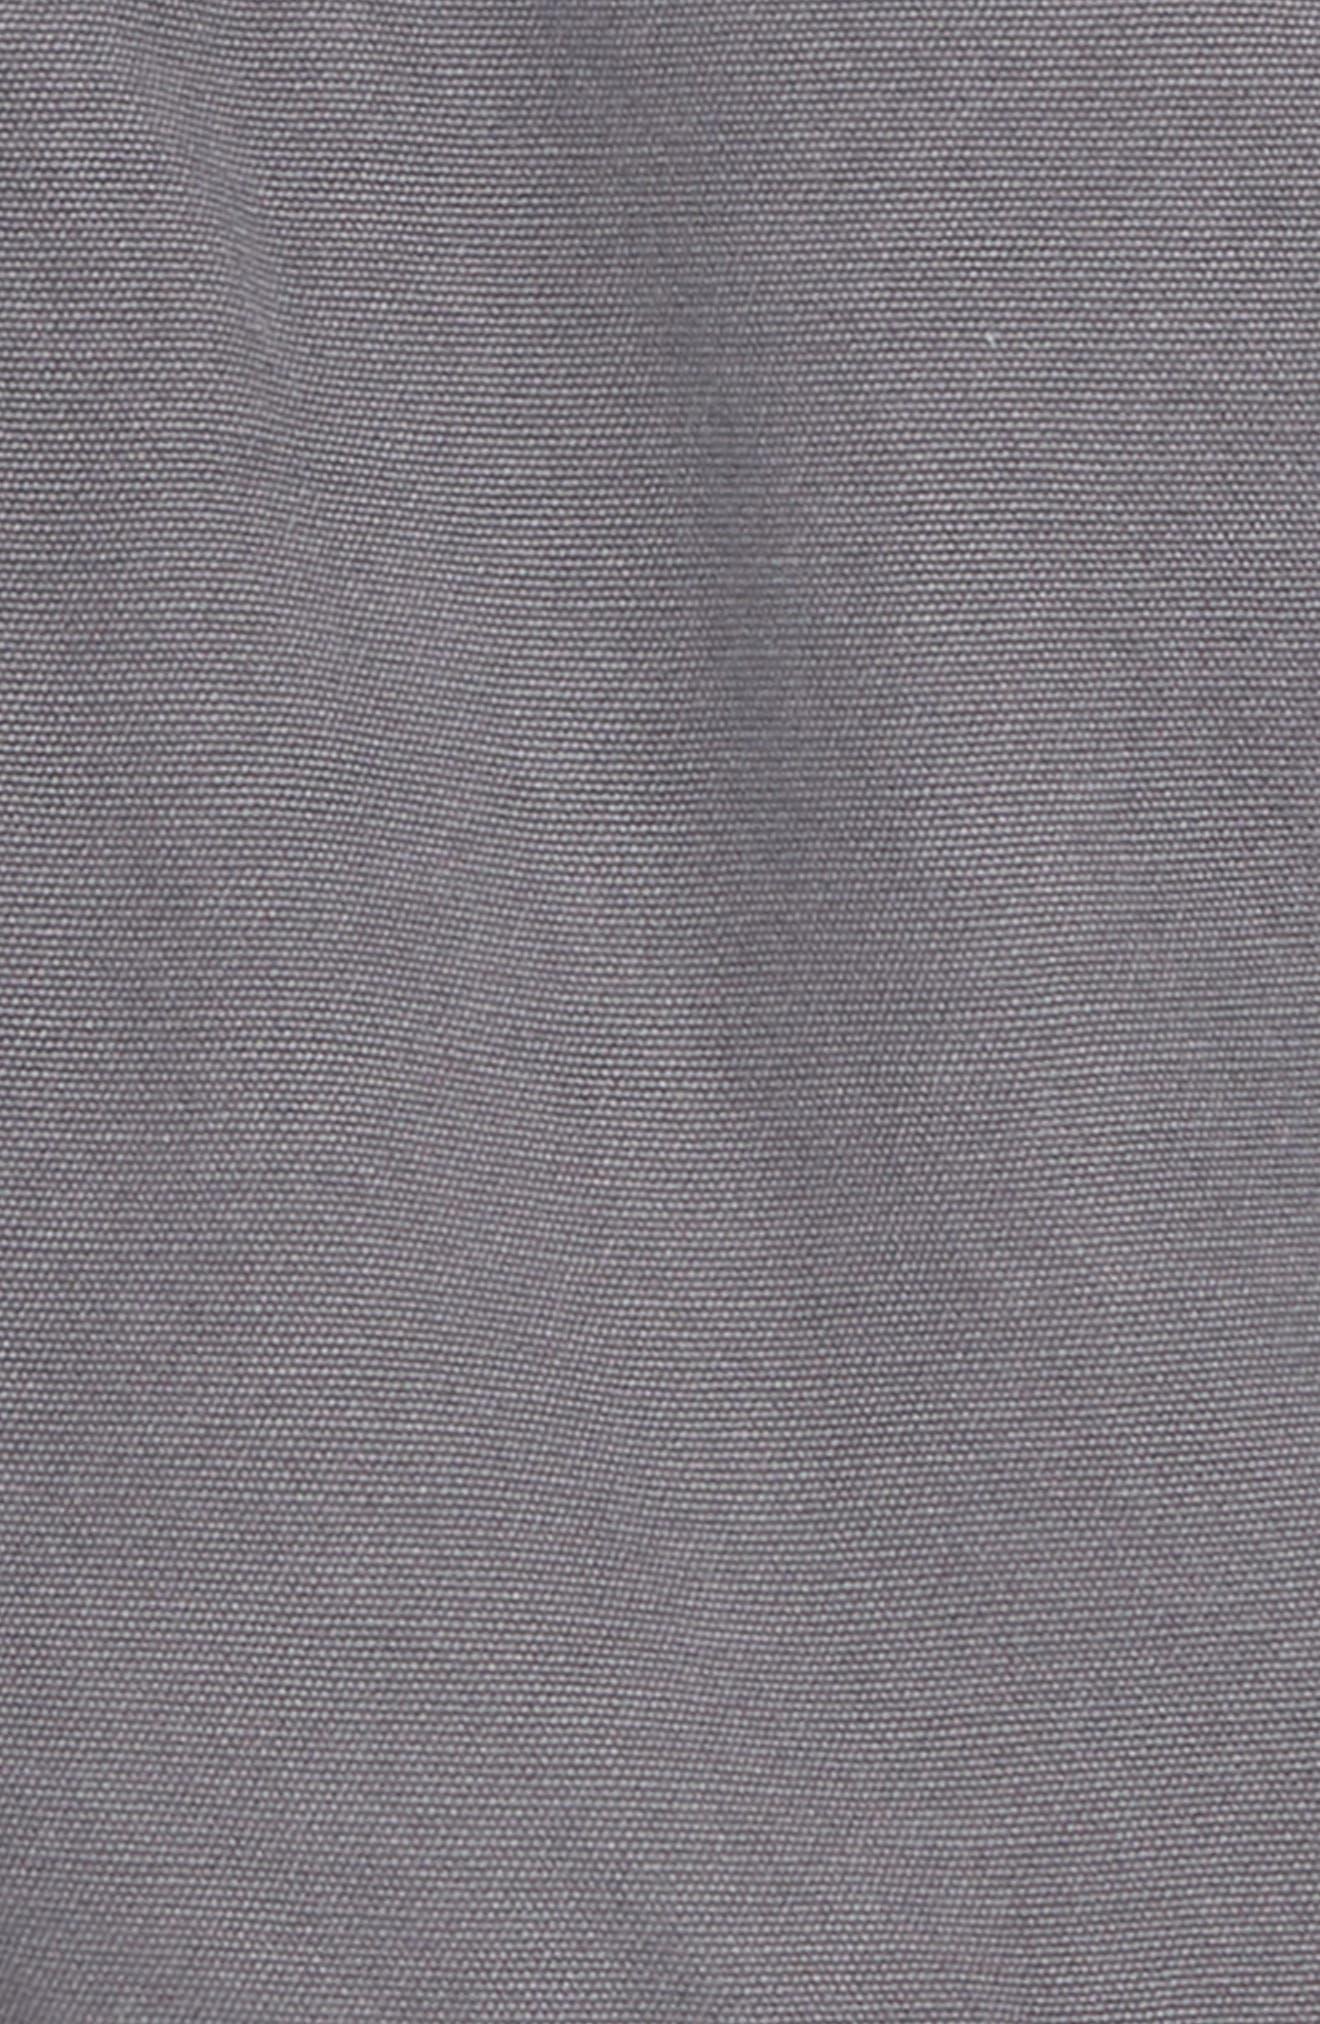 Cargo Shorts,                             Alternate thumbnail 2, color,                             021